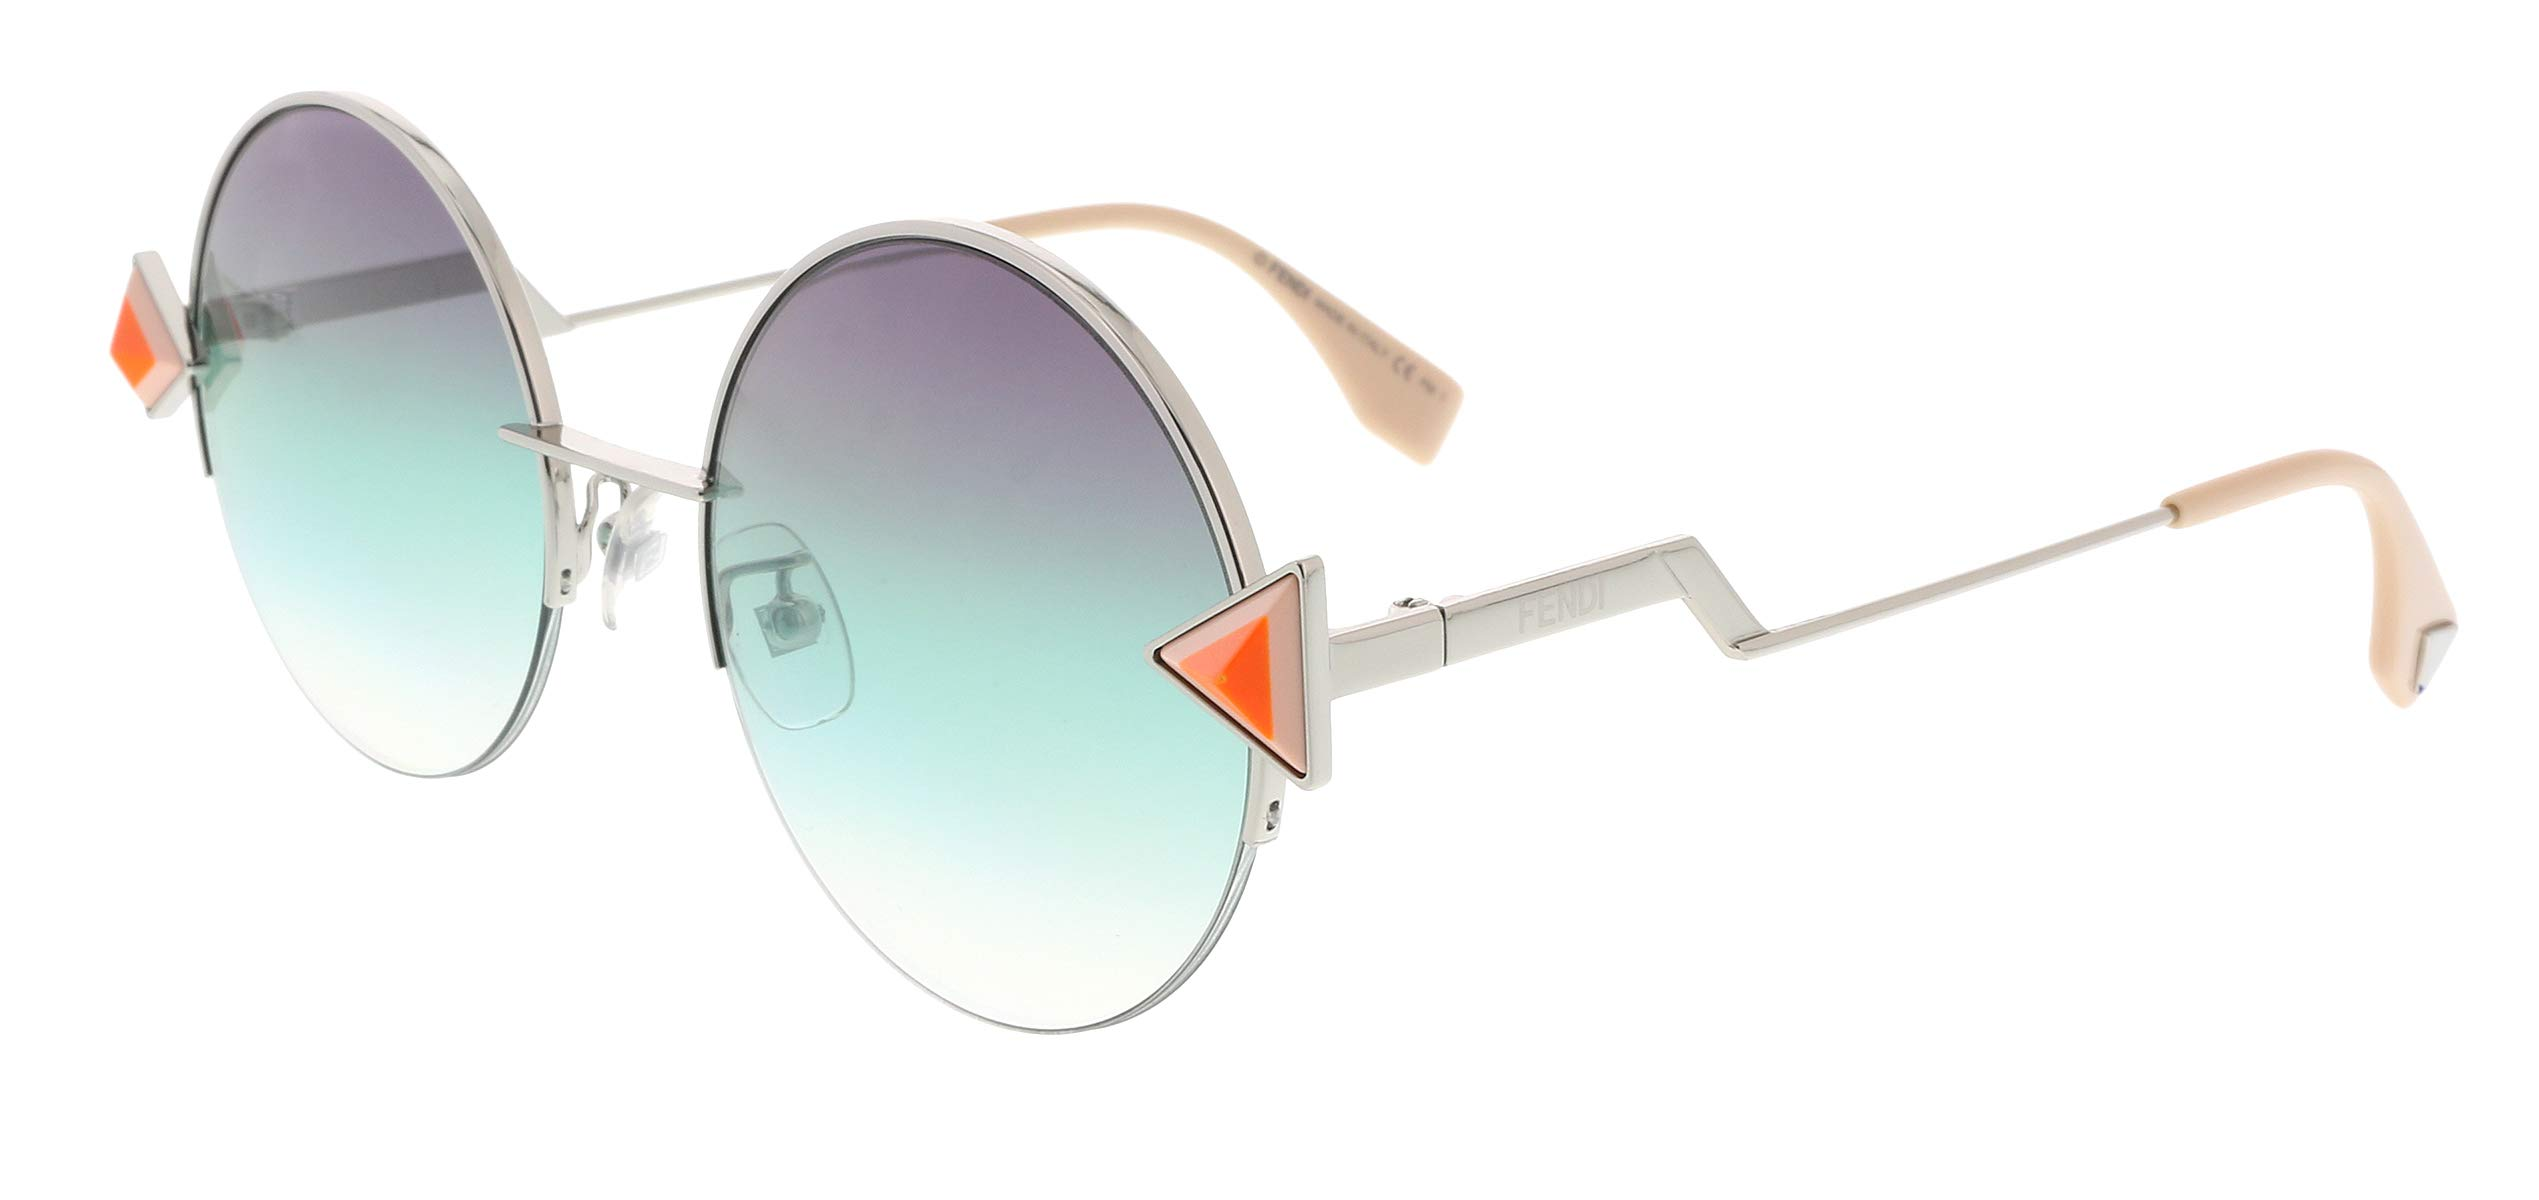 Fendi Round Sunglasses 0VGV Silver Green Frame And  Greenviolet Lens by Fendi